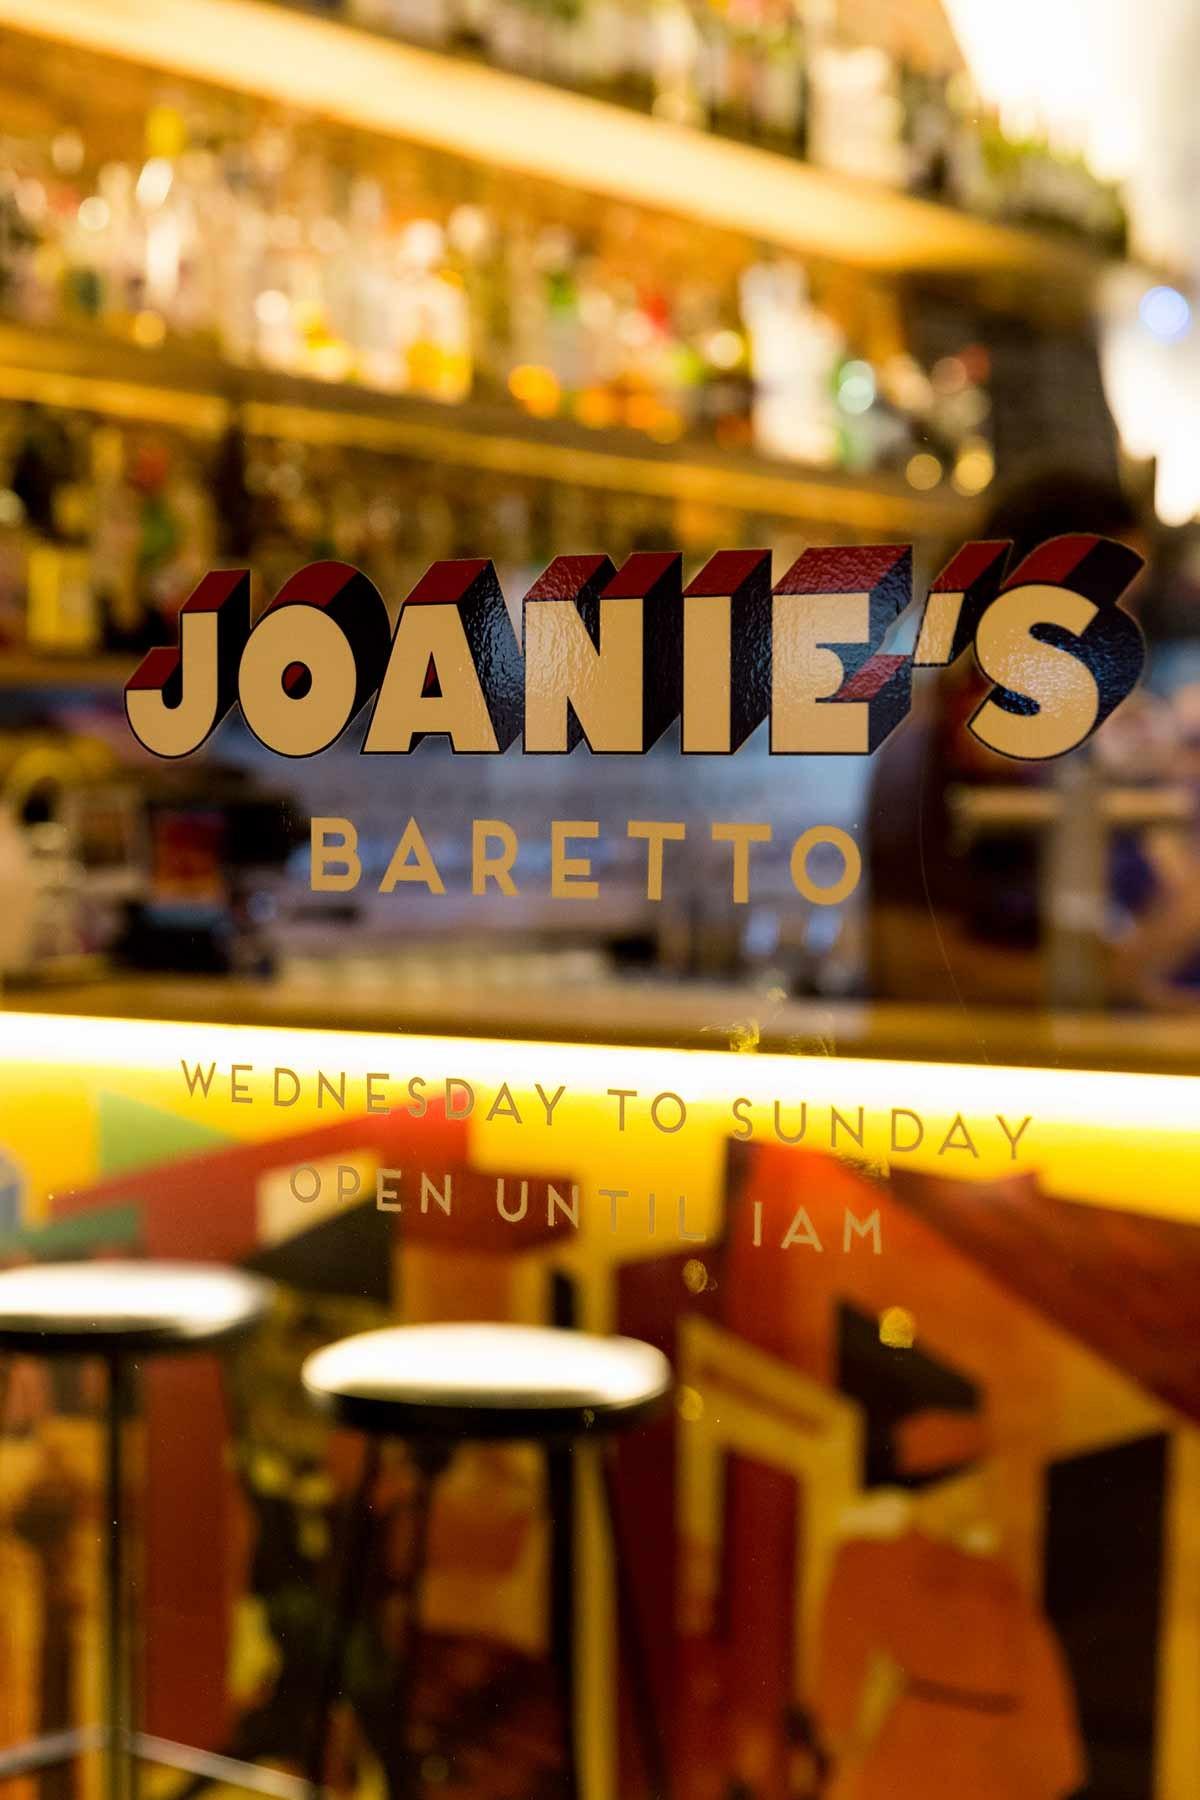 Joanie's Baretto